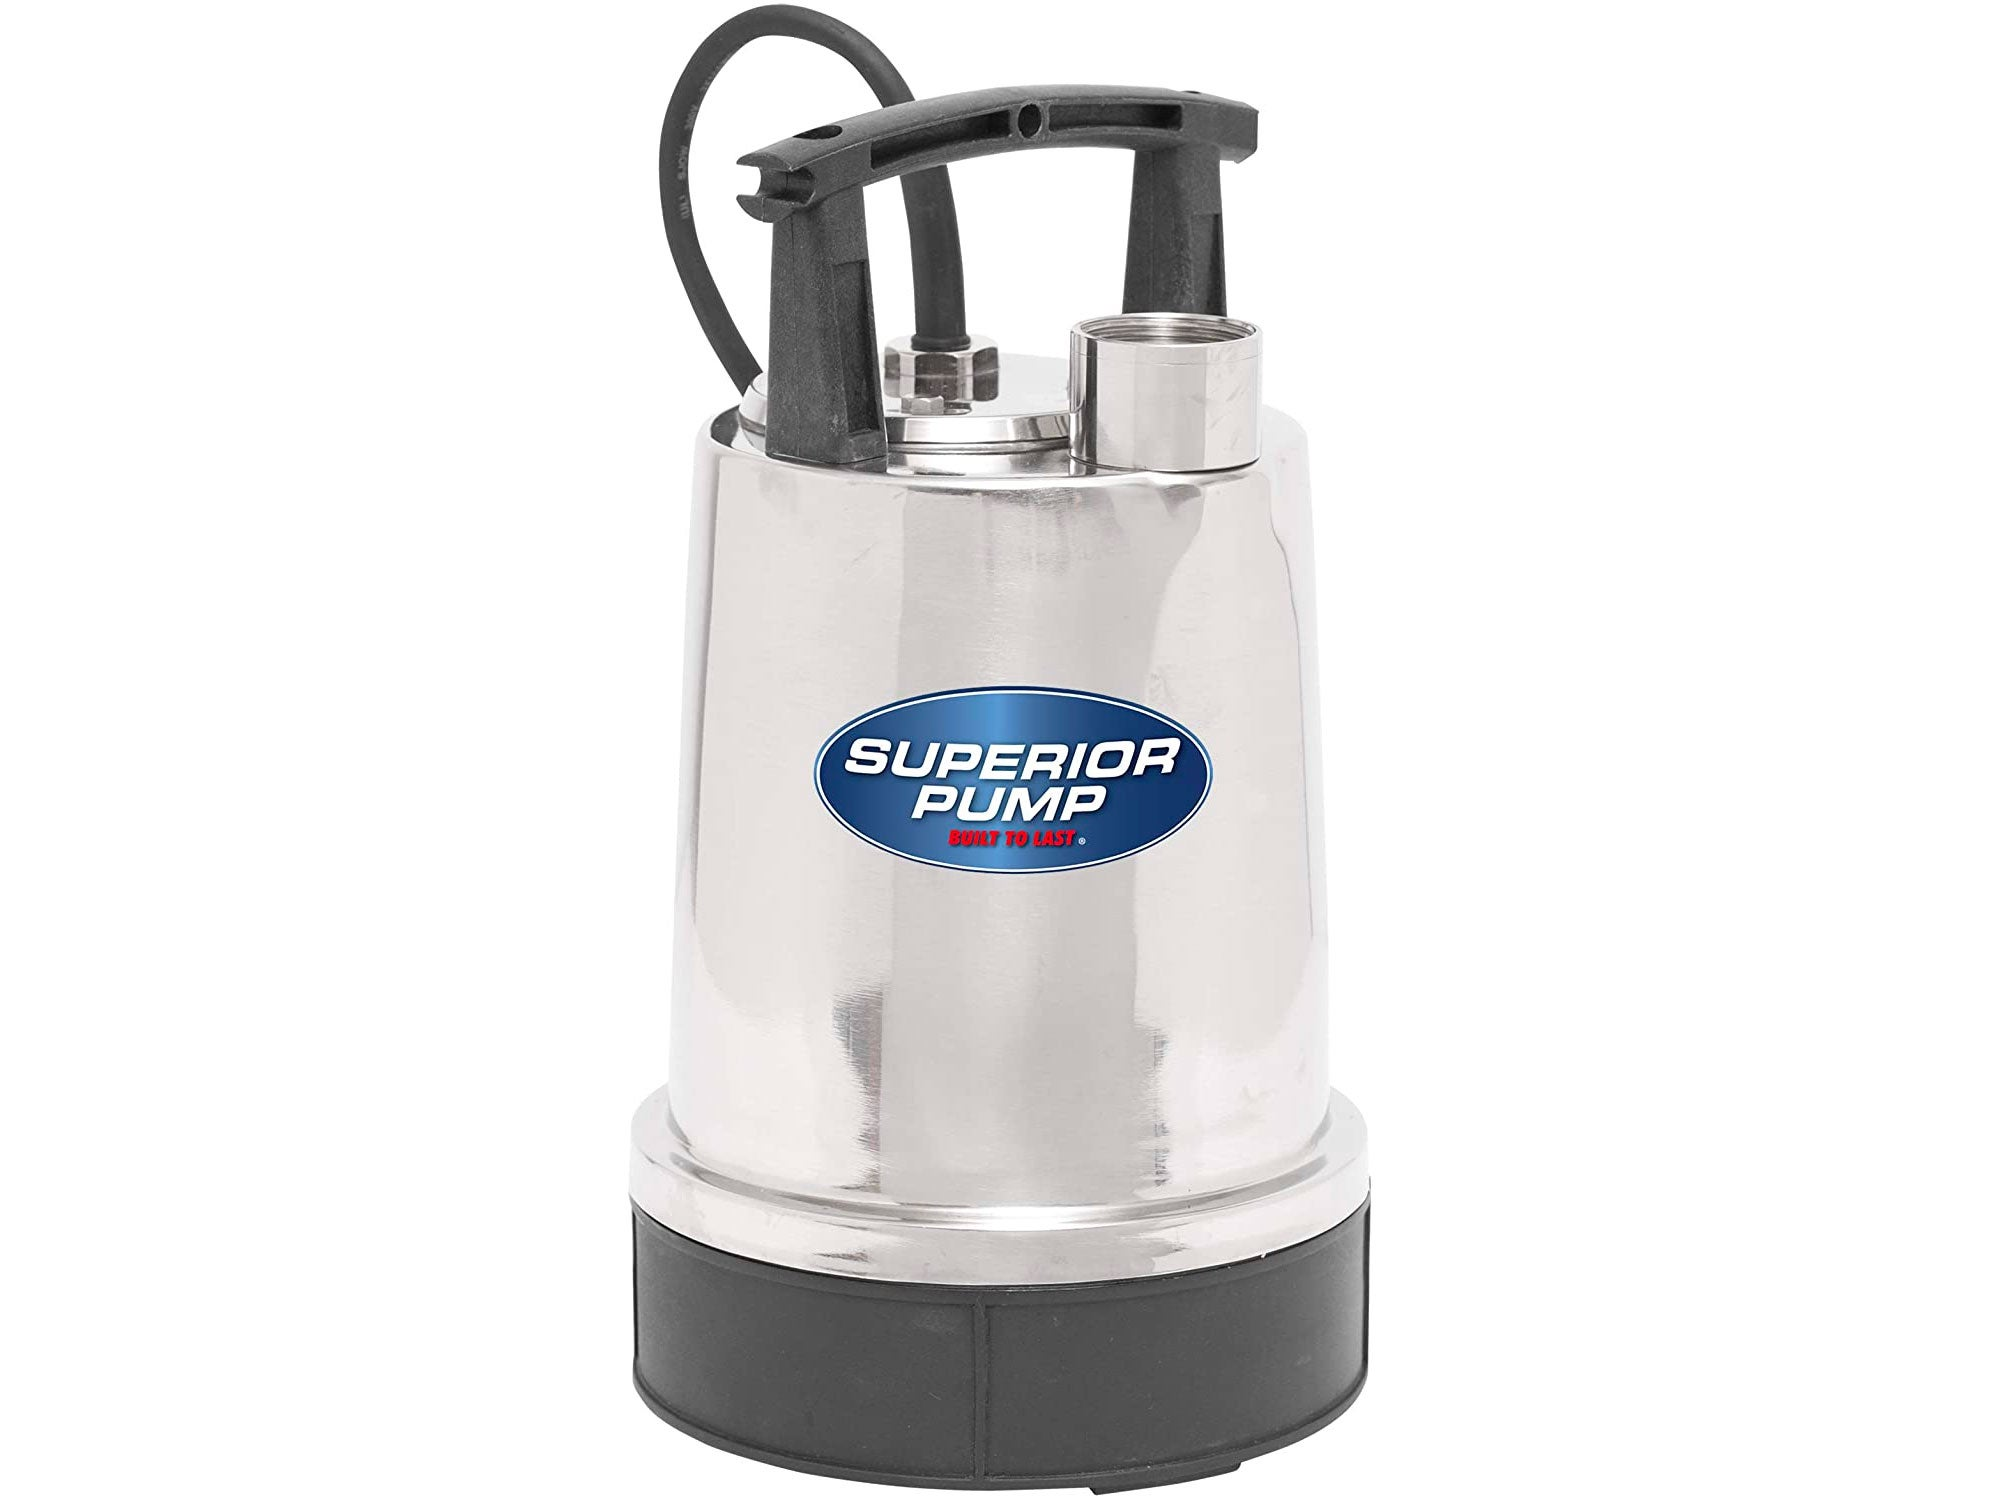 Superior Pump Stainless 1/2 HP Steel Utility Pump.